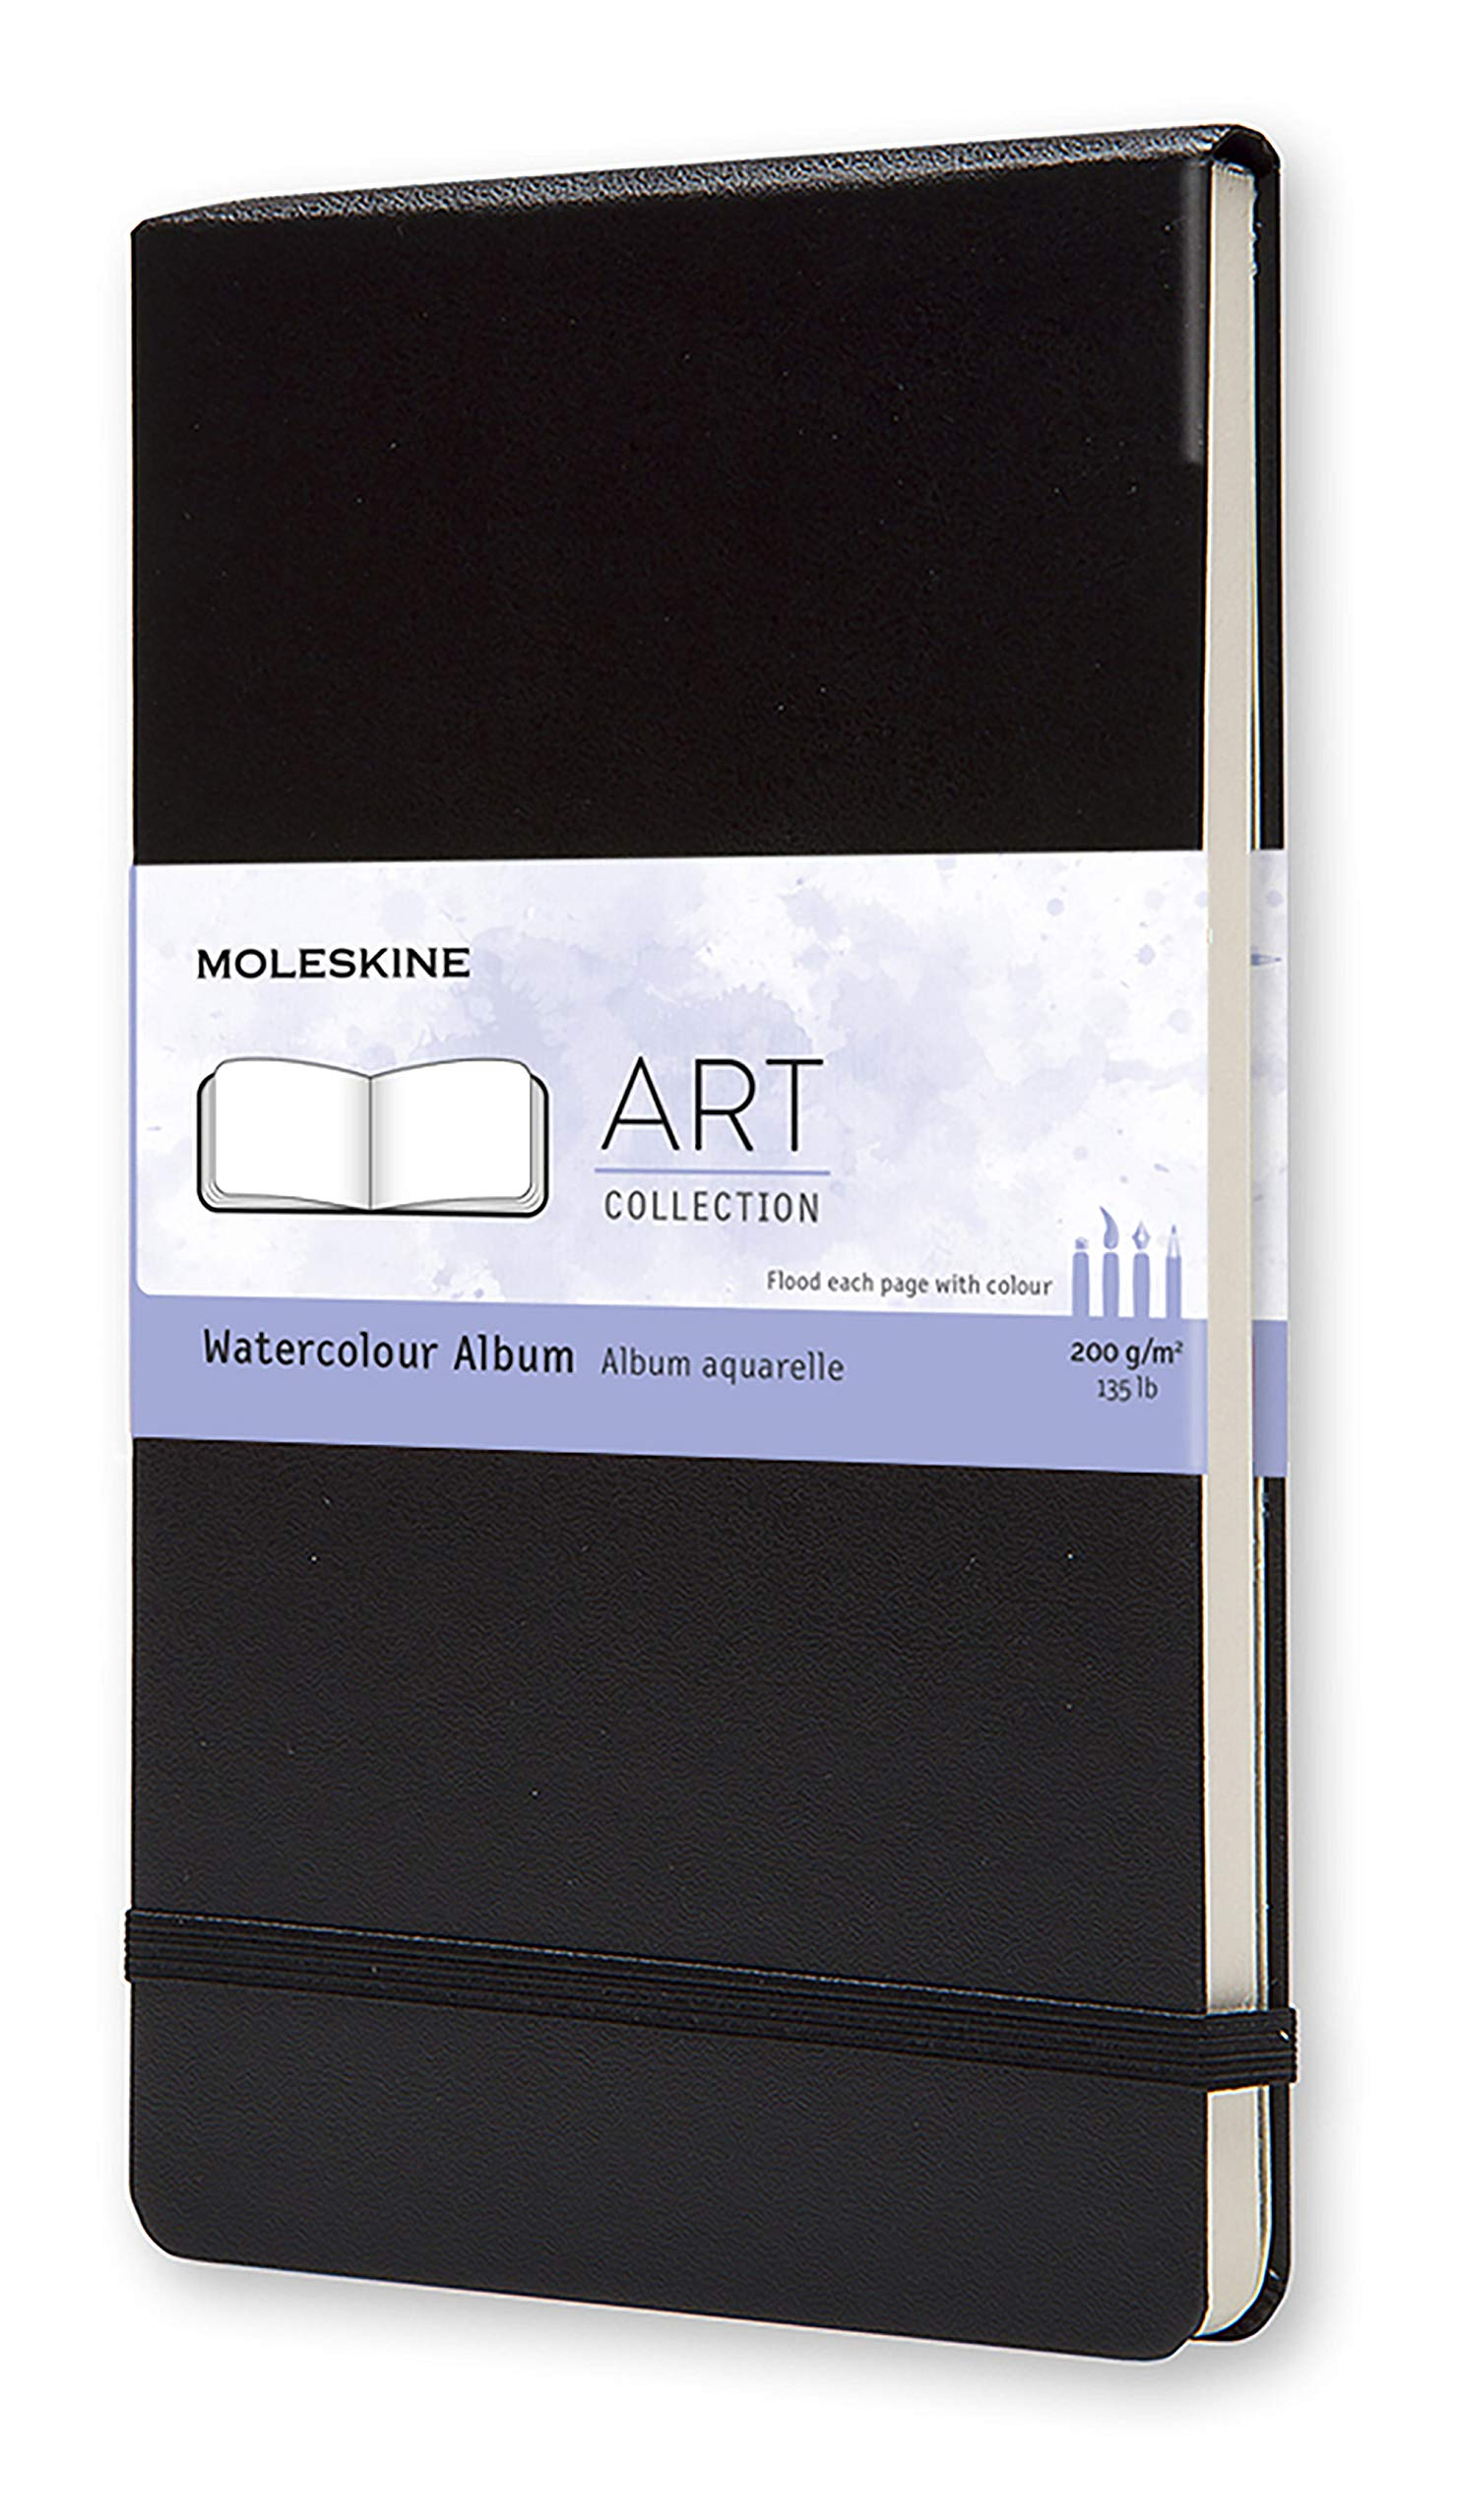 Moleskine Art Watercolor Album, Hard Cover, Large (5'' x 8.25'') Plain/Blank, Black by Moleskine